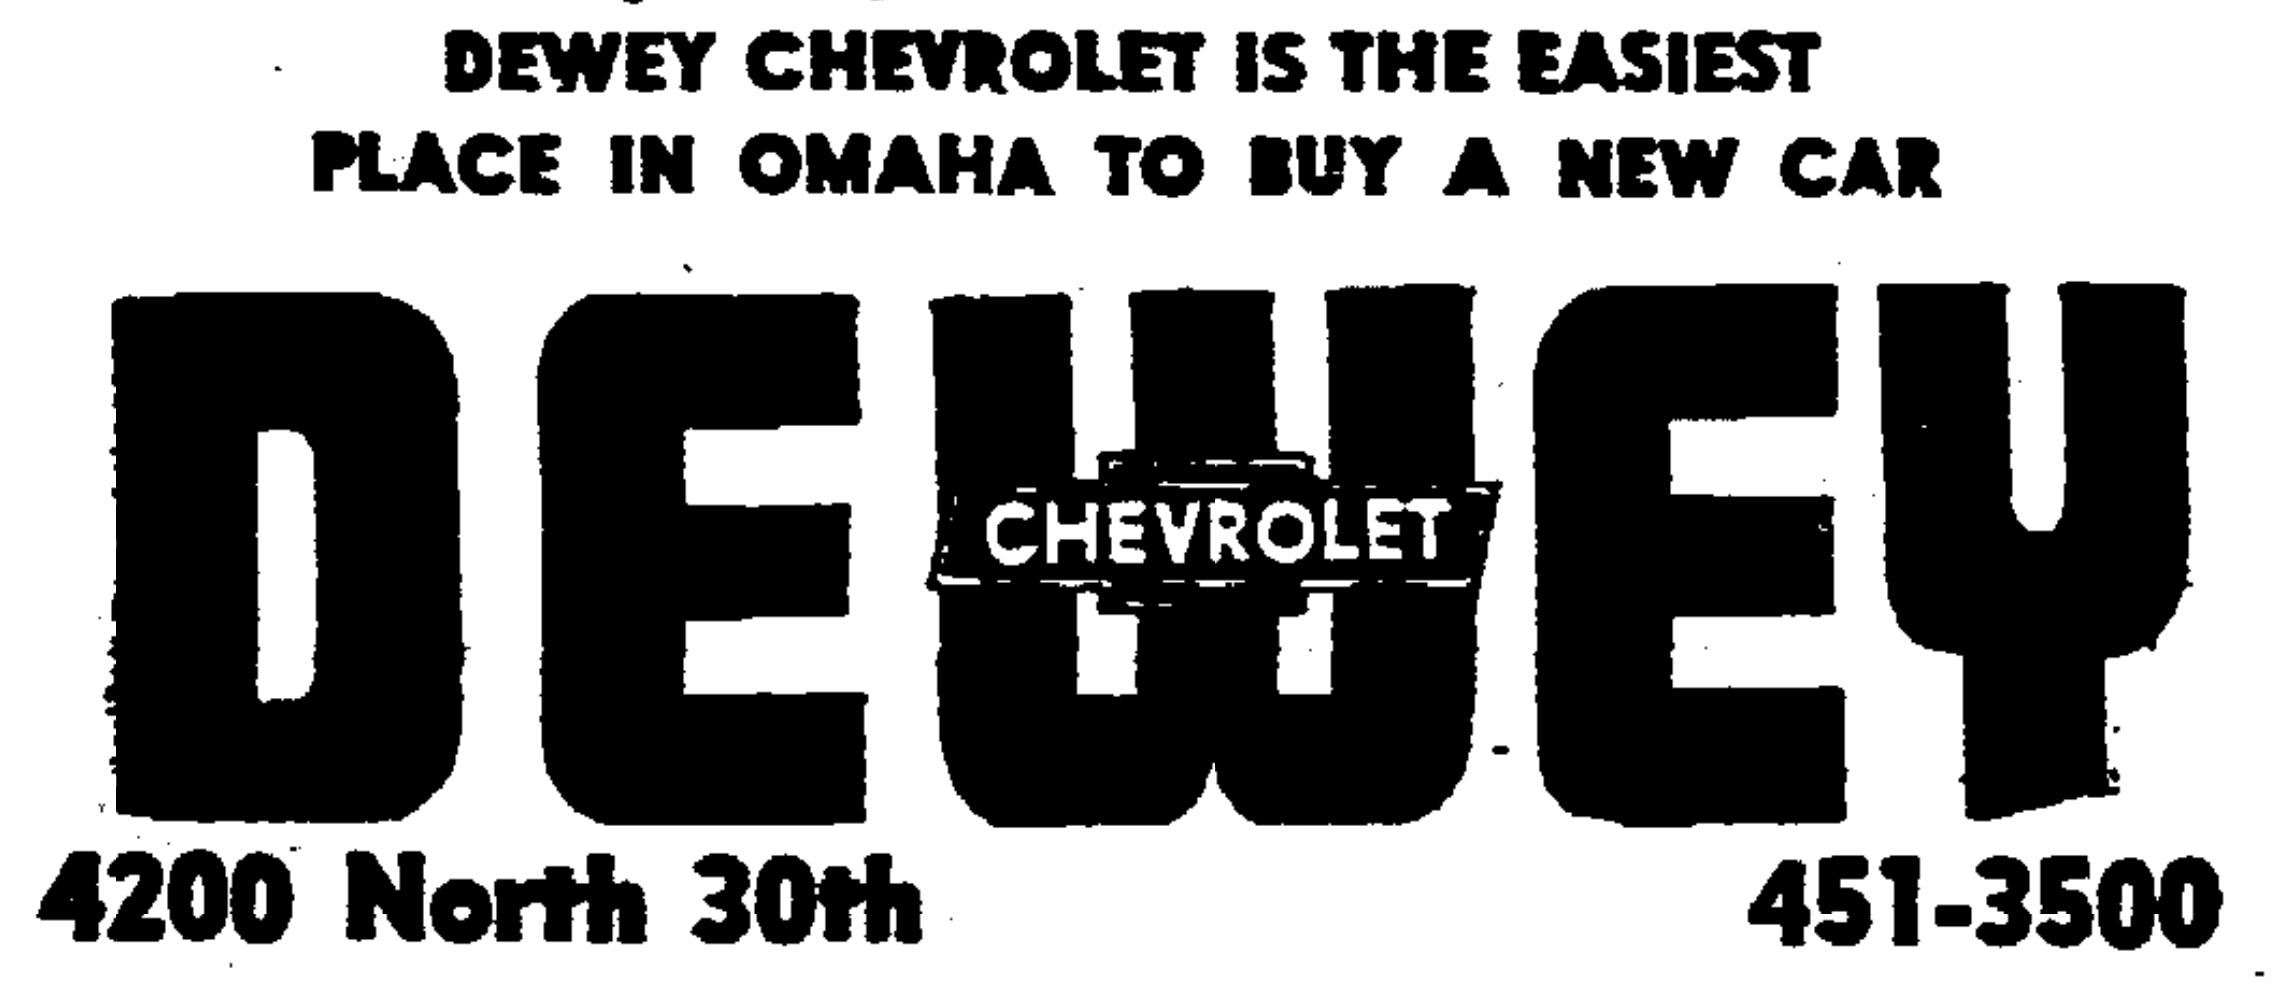 Dewey Chevrolet, 4200 N. 30th St., North Omaha, Nebraska